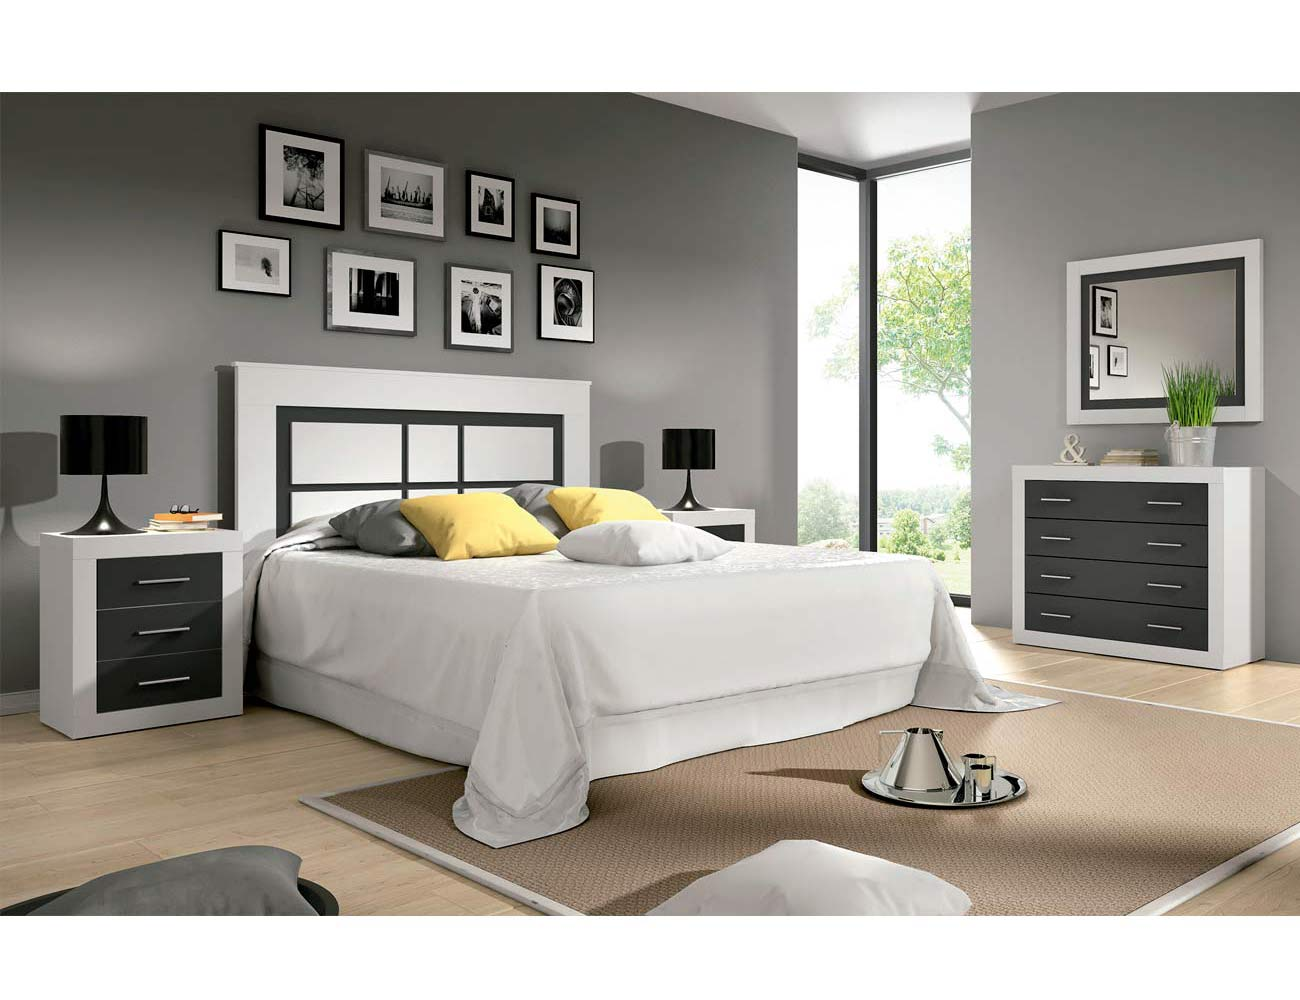 Dormitorio de matrimonio moderno en blanco con grafito for Dormitorio matrimonio blanco